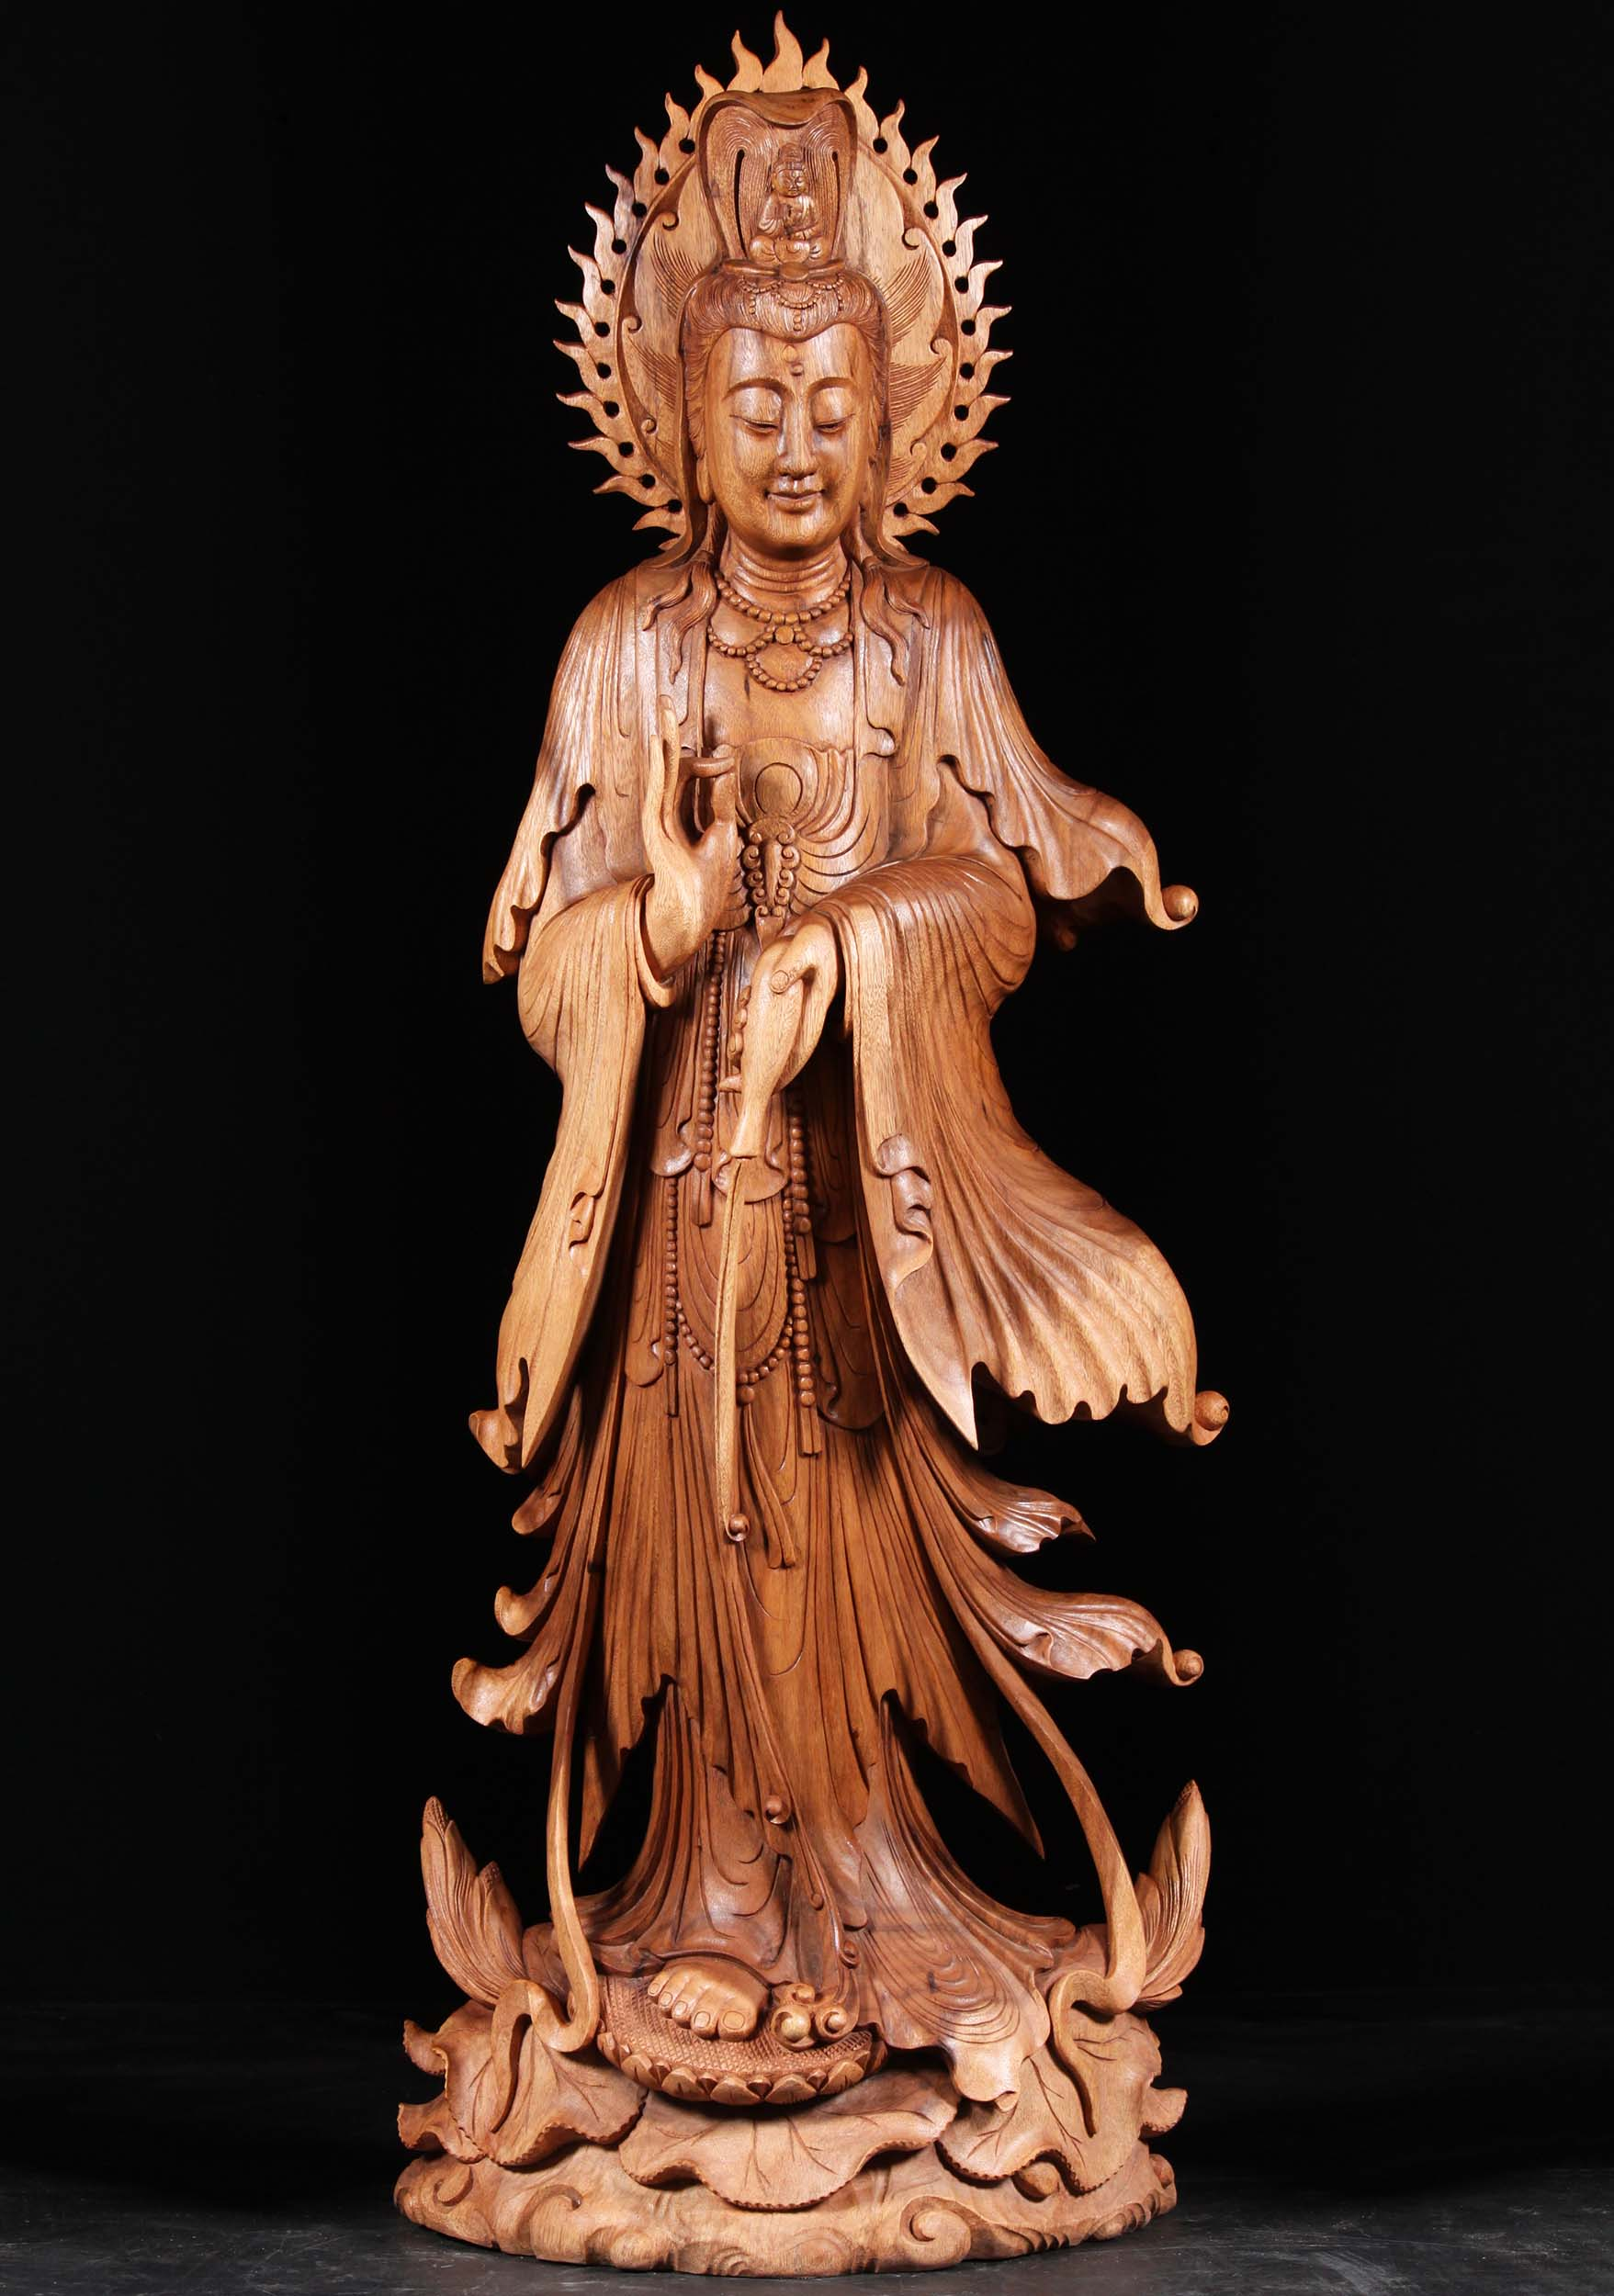 Large Kuan Yin Garden Statue Holding Willow Branch Designs